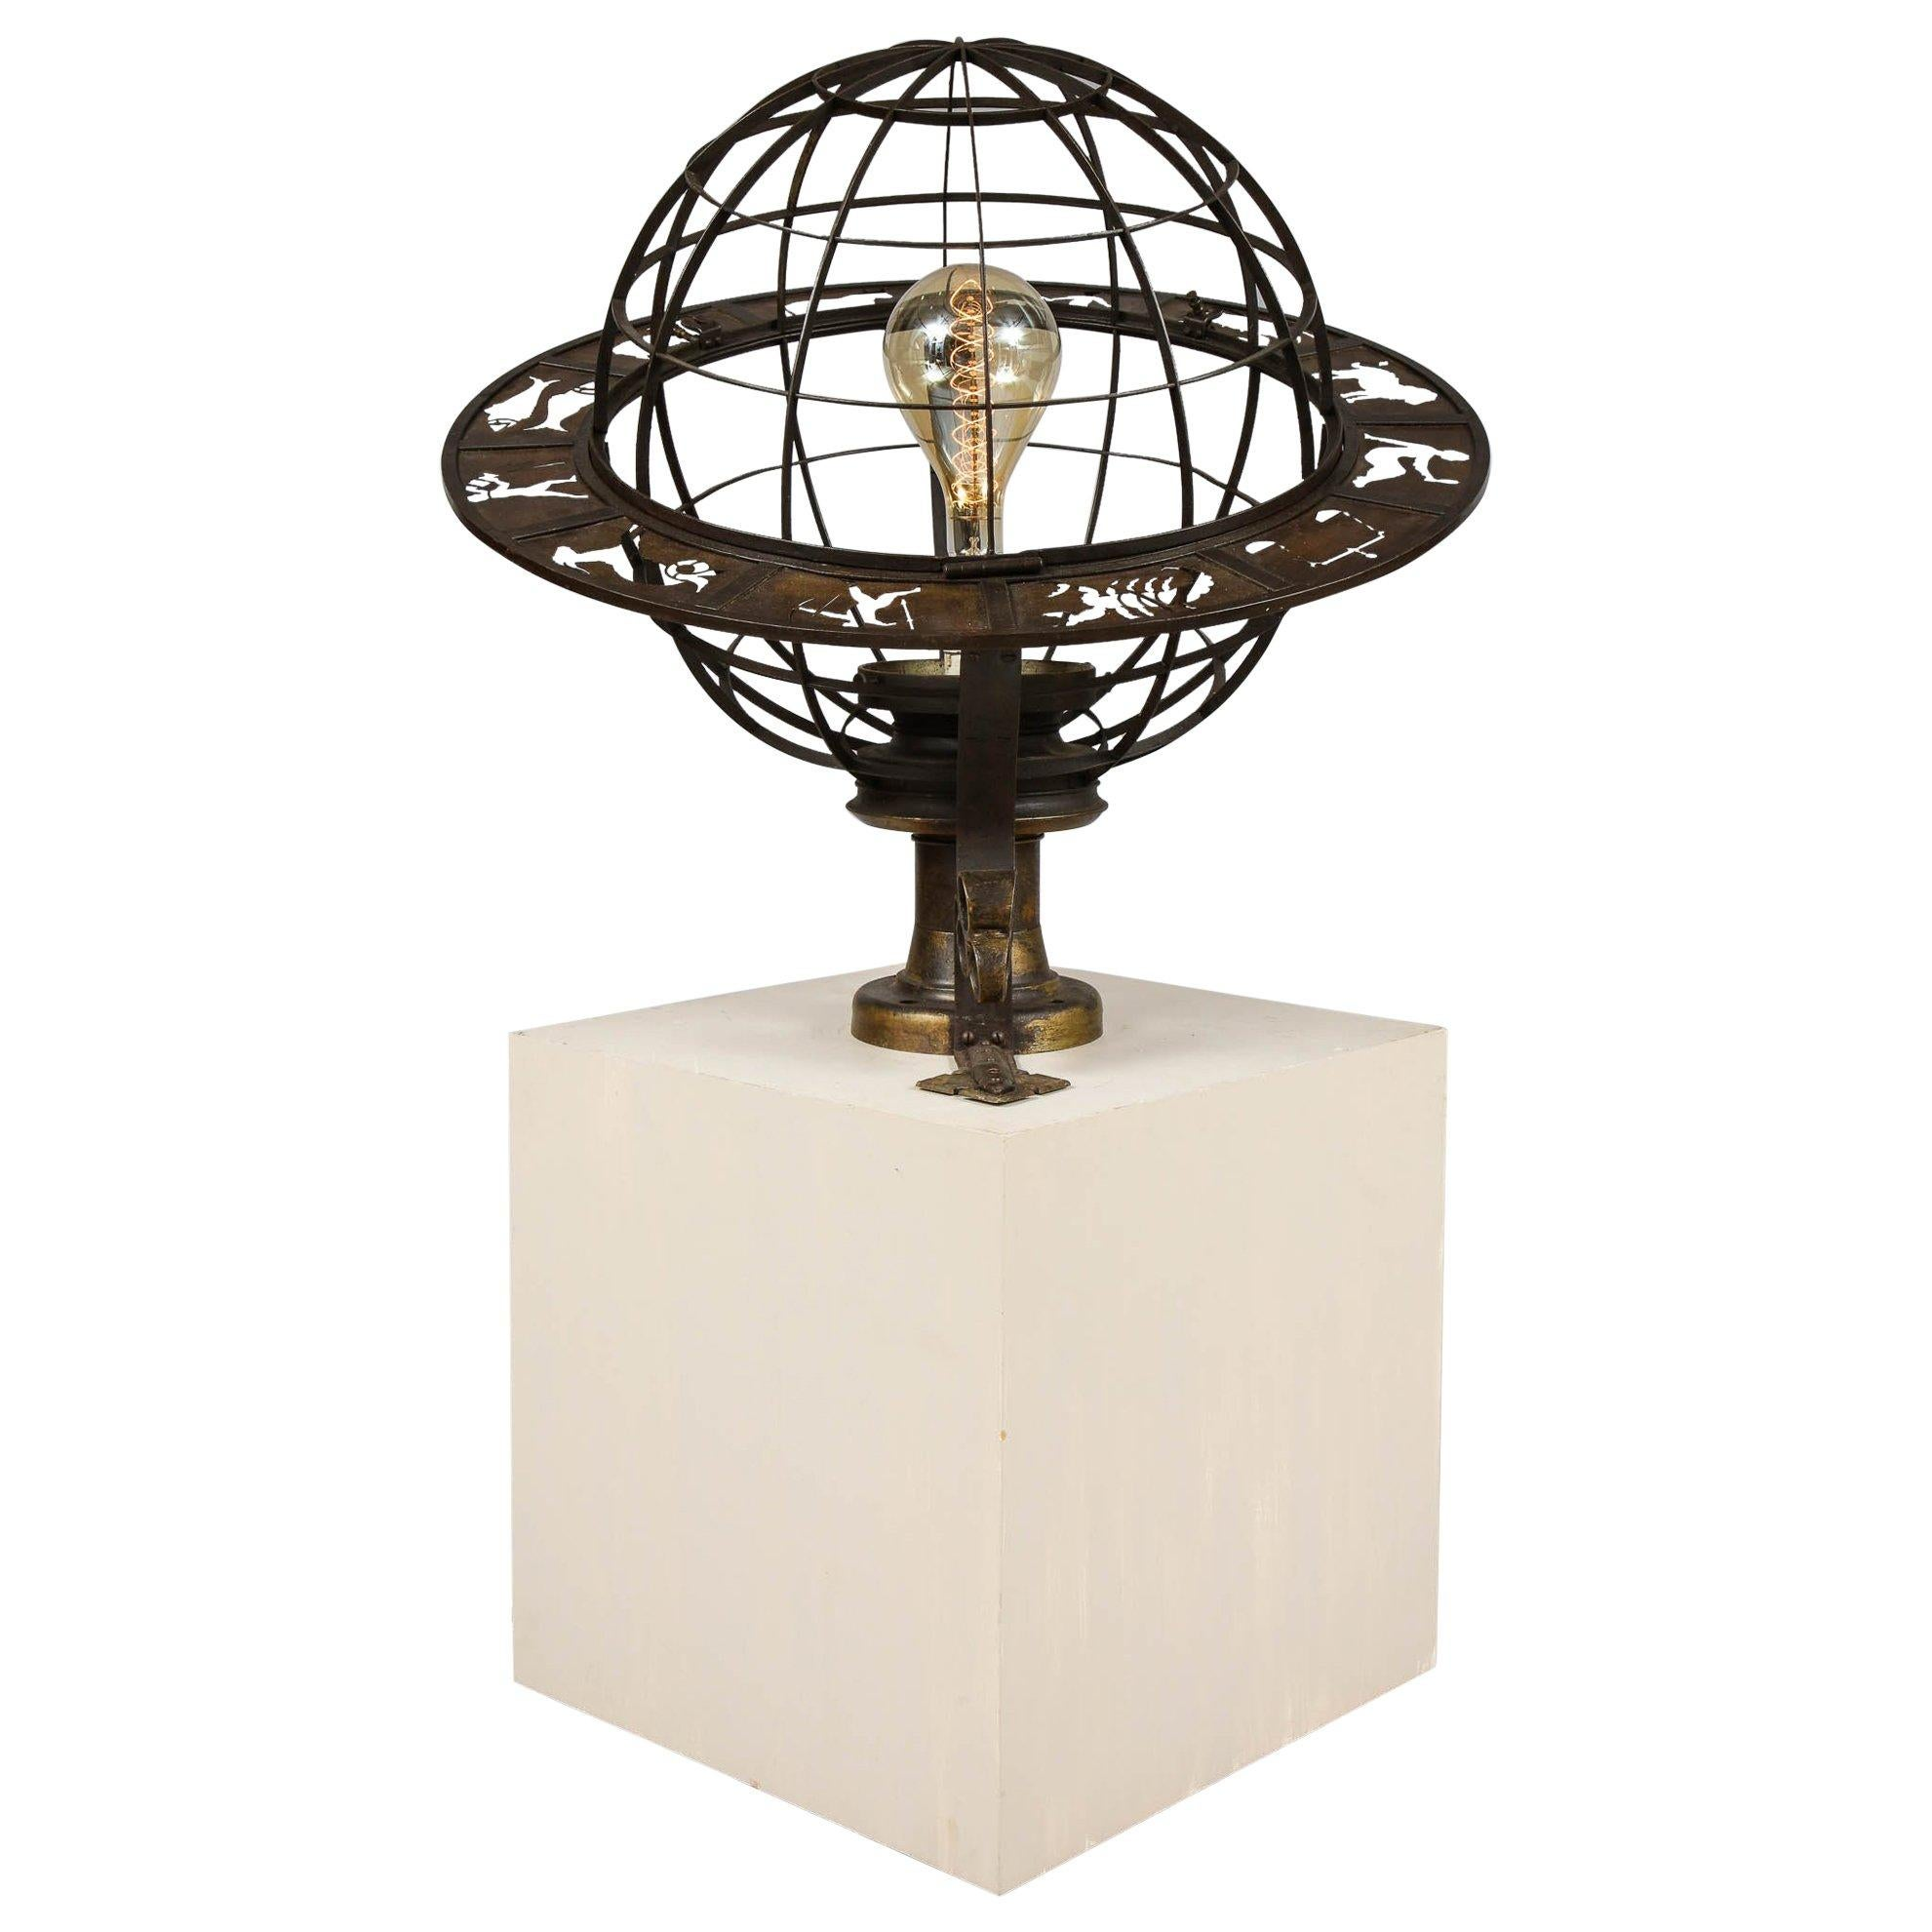 Celestial Light Fixture